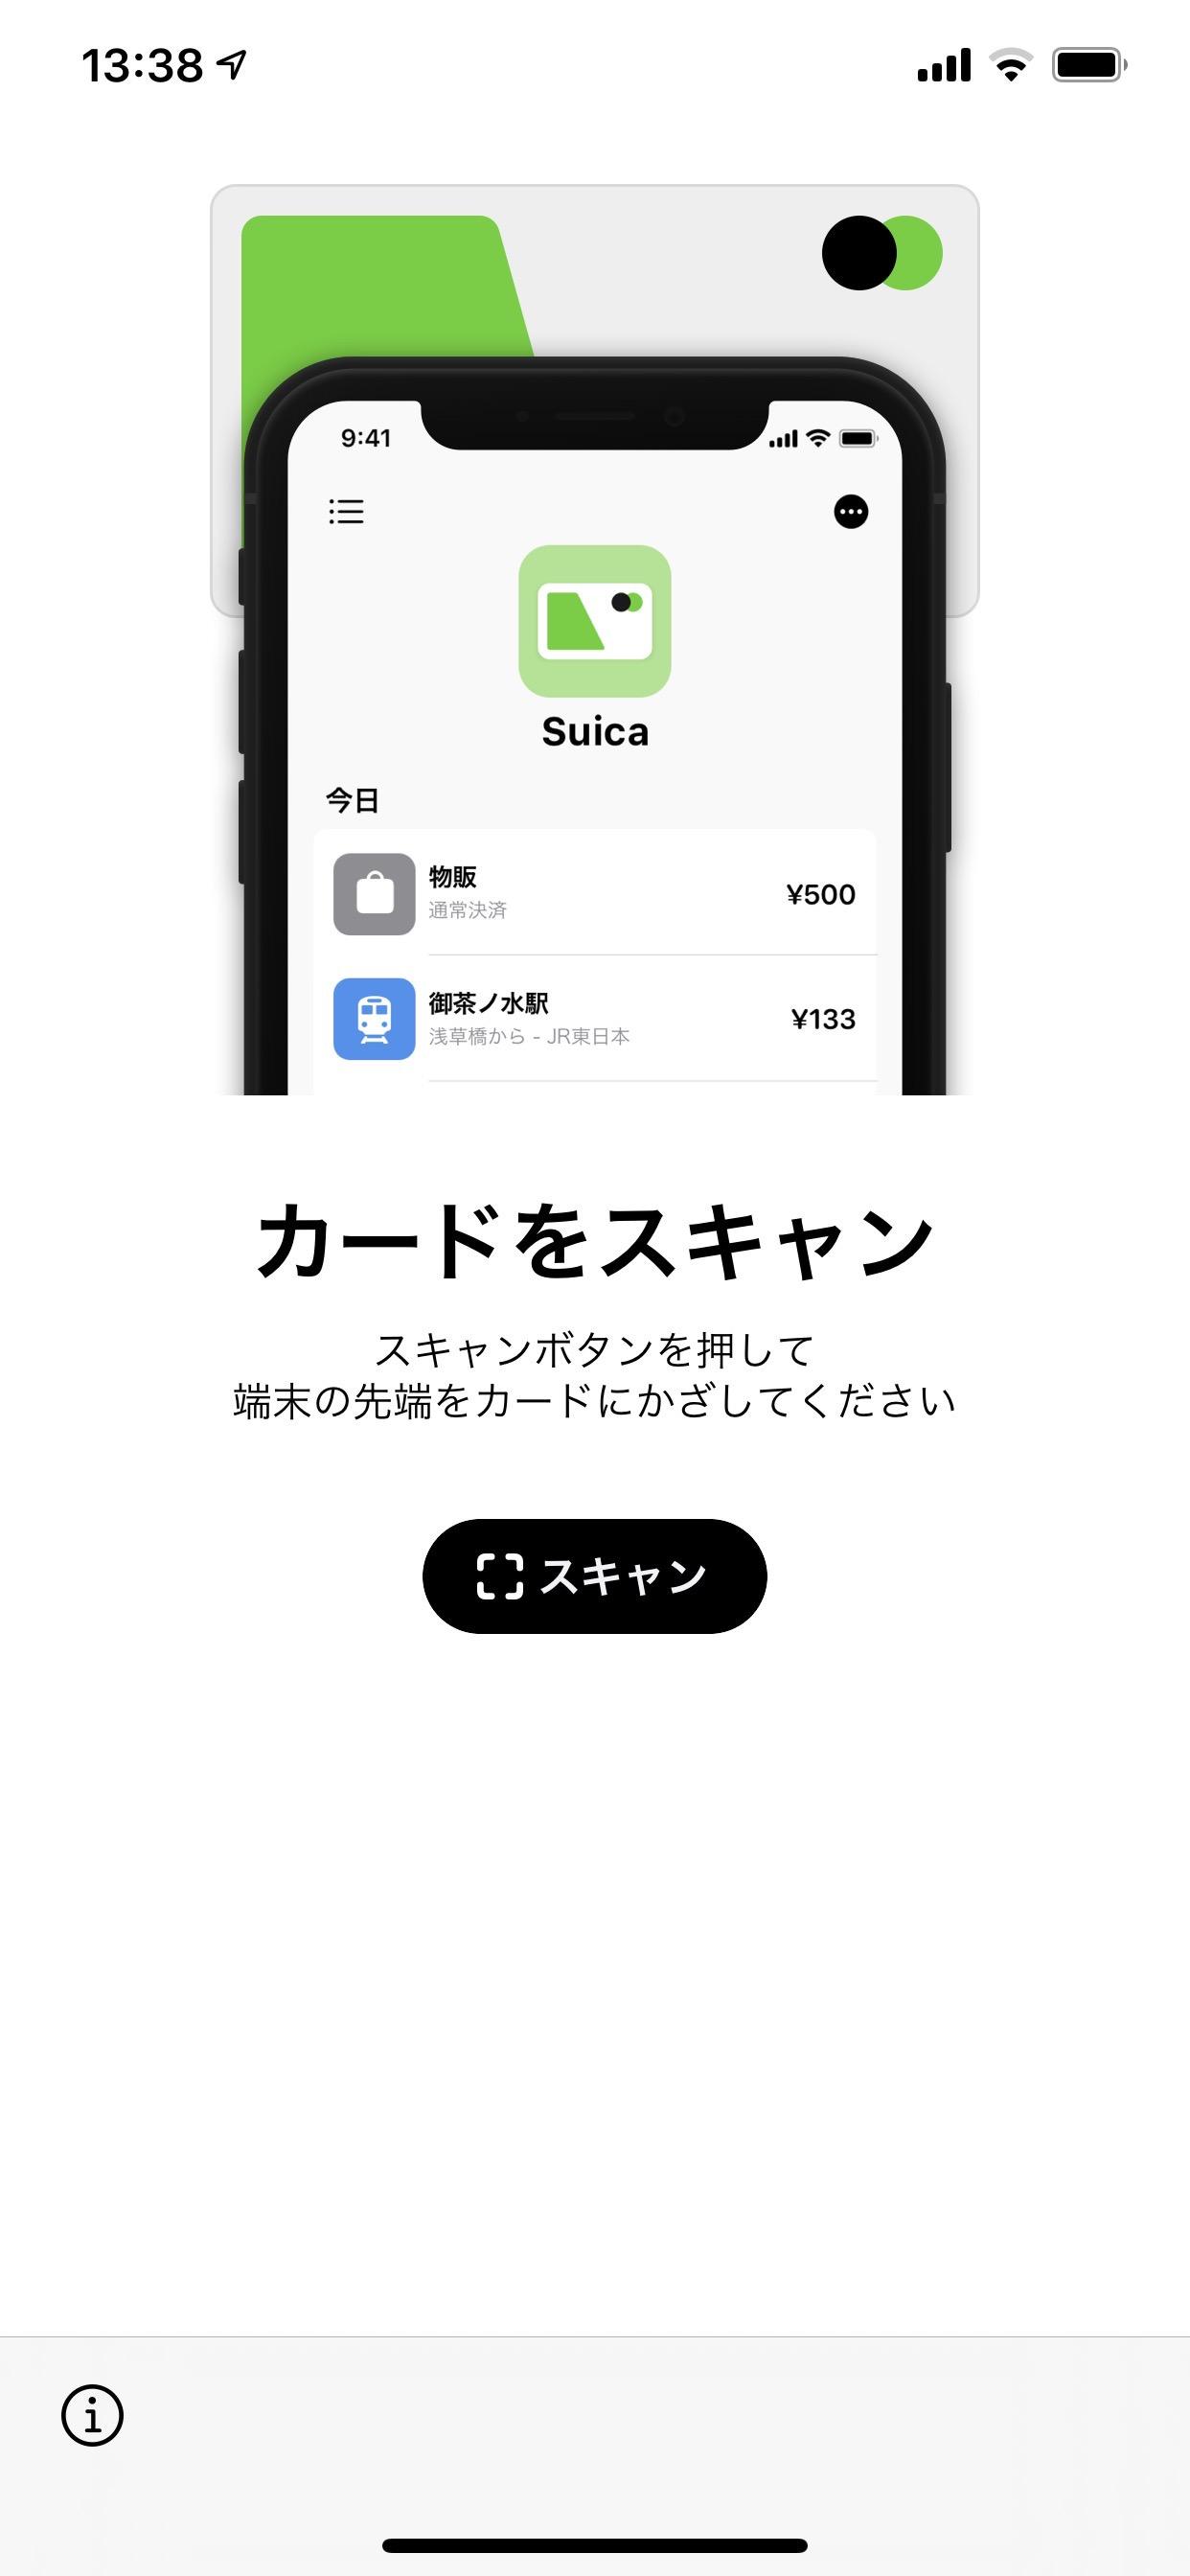 「ICリーダー」Suica・PASMOなど交通系ICカードやEdy・nanaco・WAONの残高を読み取るiPhoneアプリ